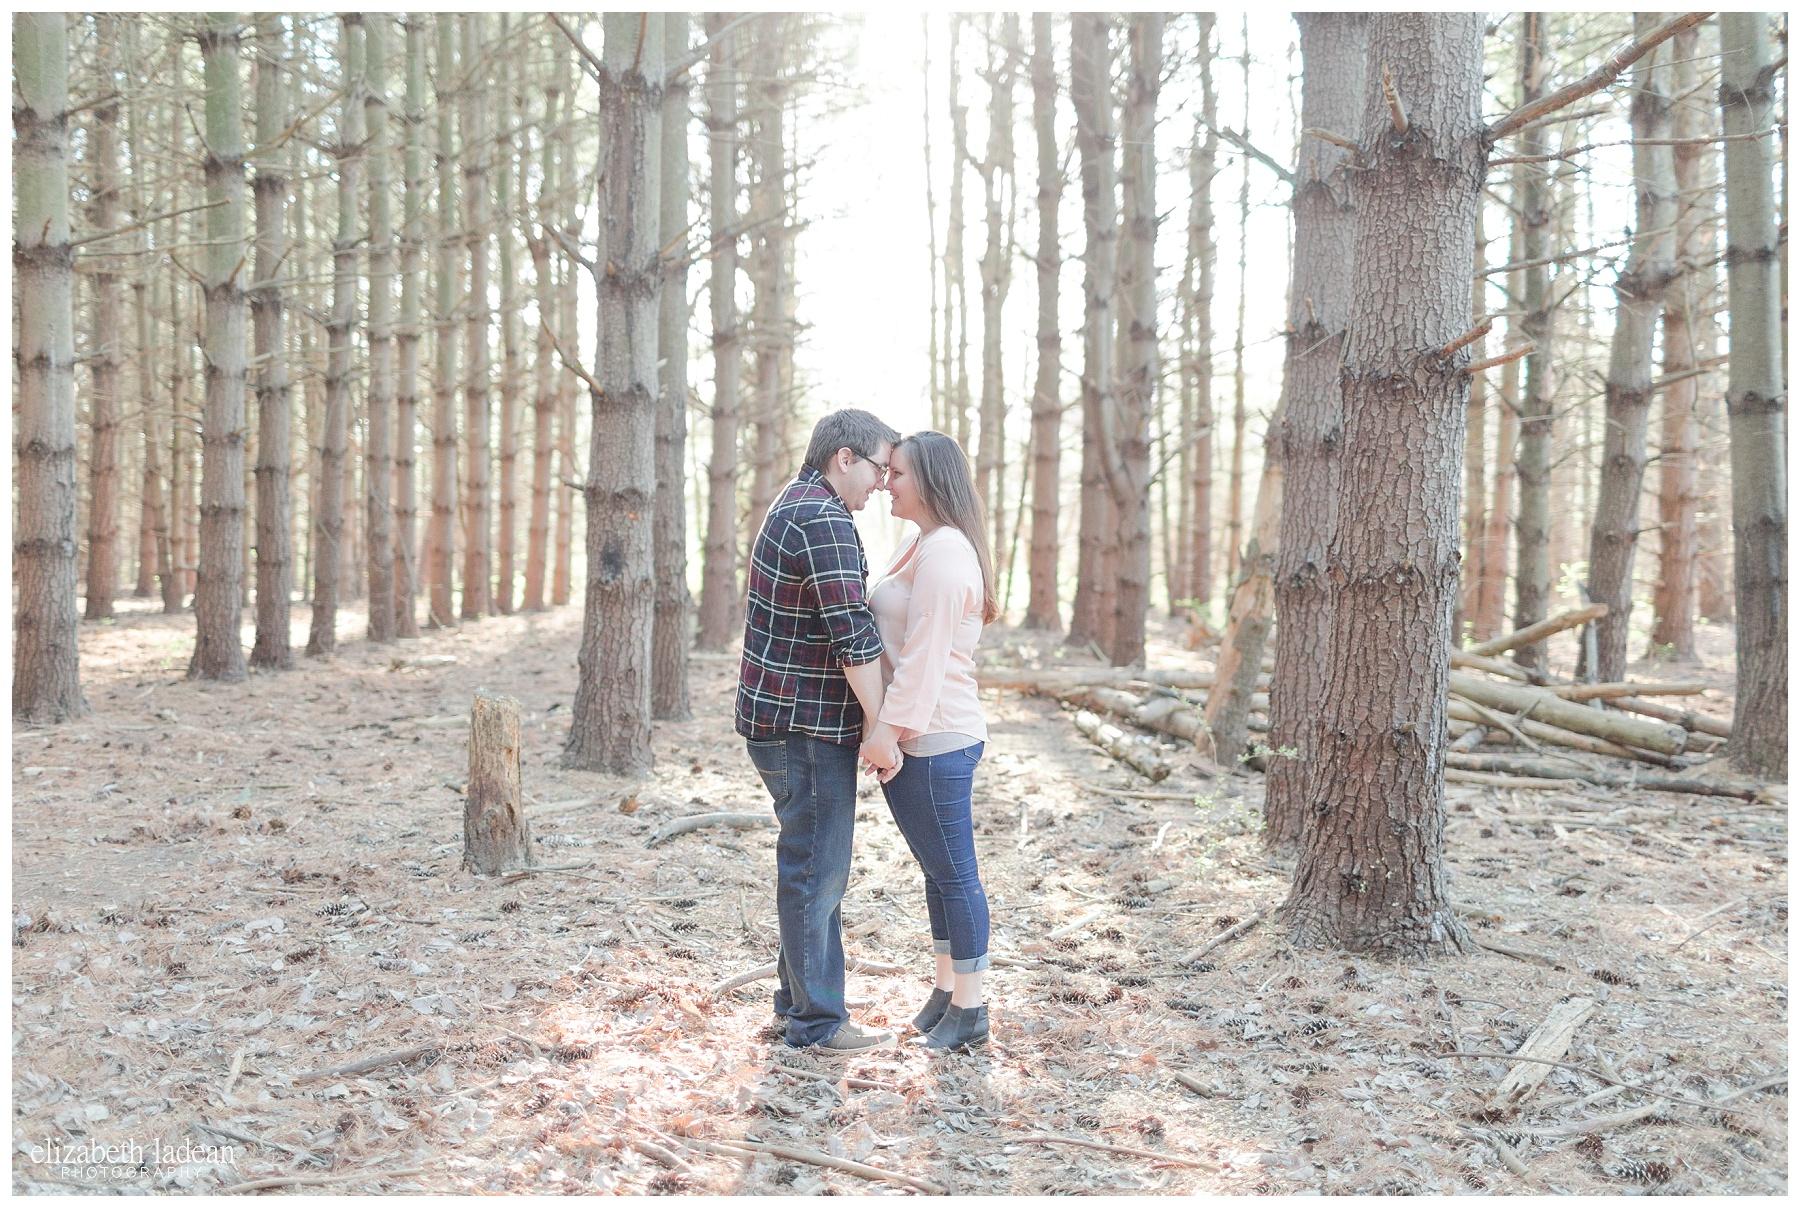 Burr-Oak-Woods-Engagement-Photos-Kansas City-S+J-2017-Elizabeth-Ladean-Photography-photo_0487.jpg